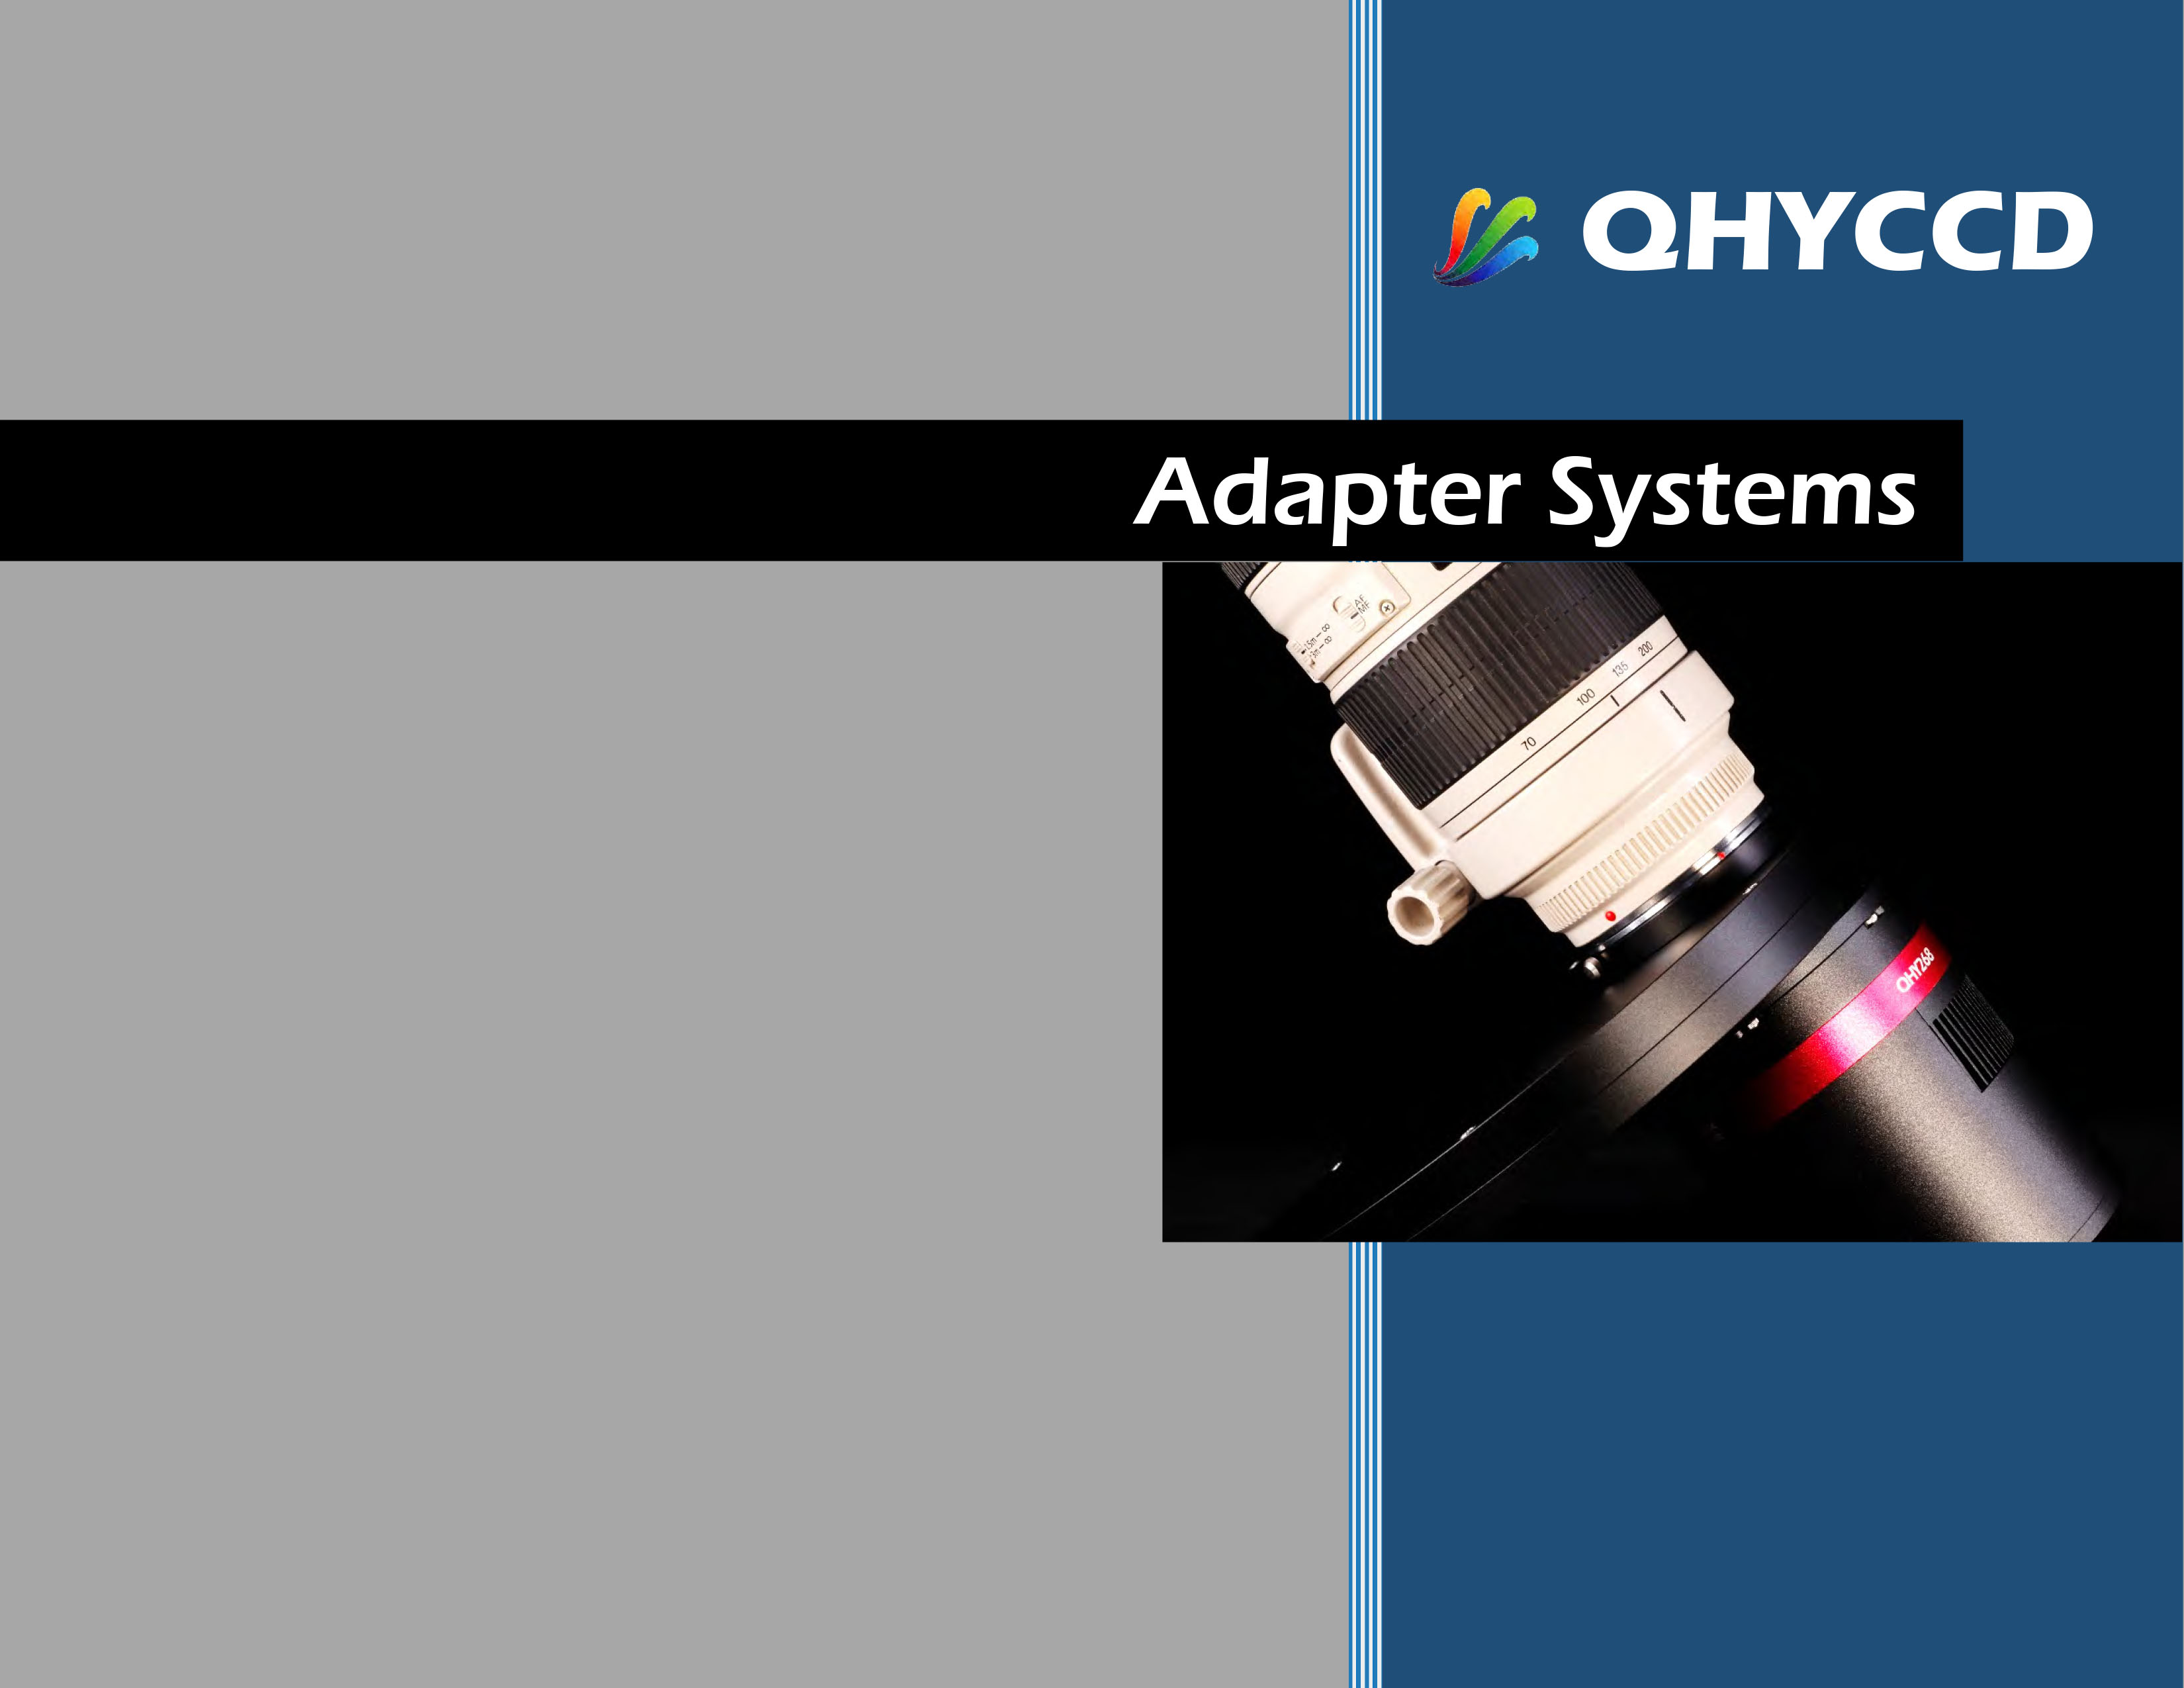 Alle Details zu den QHYCCD Komplett-Adaptersets (englische Version)